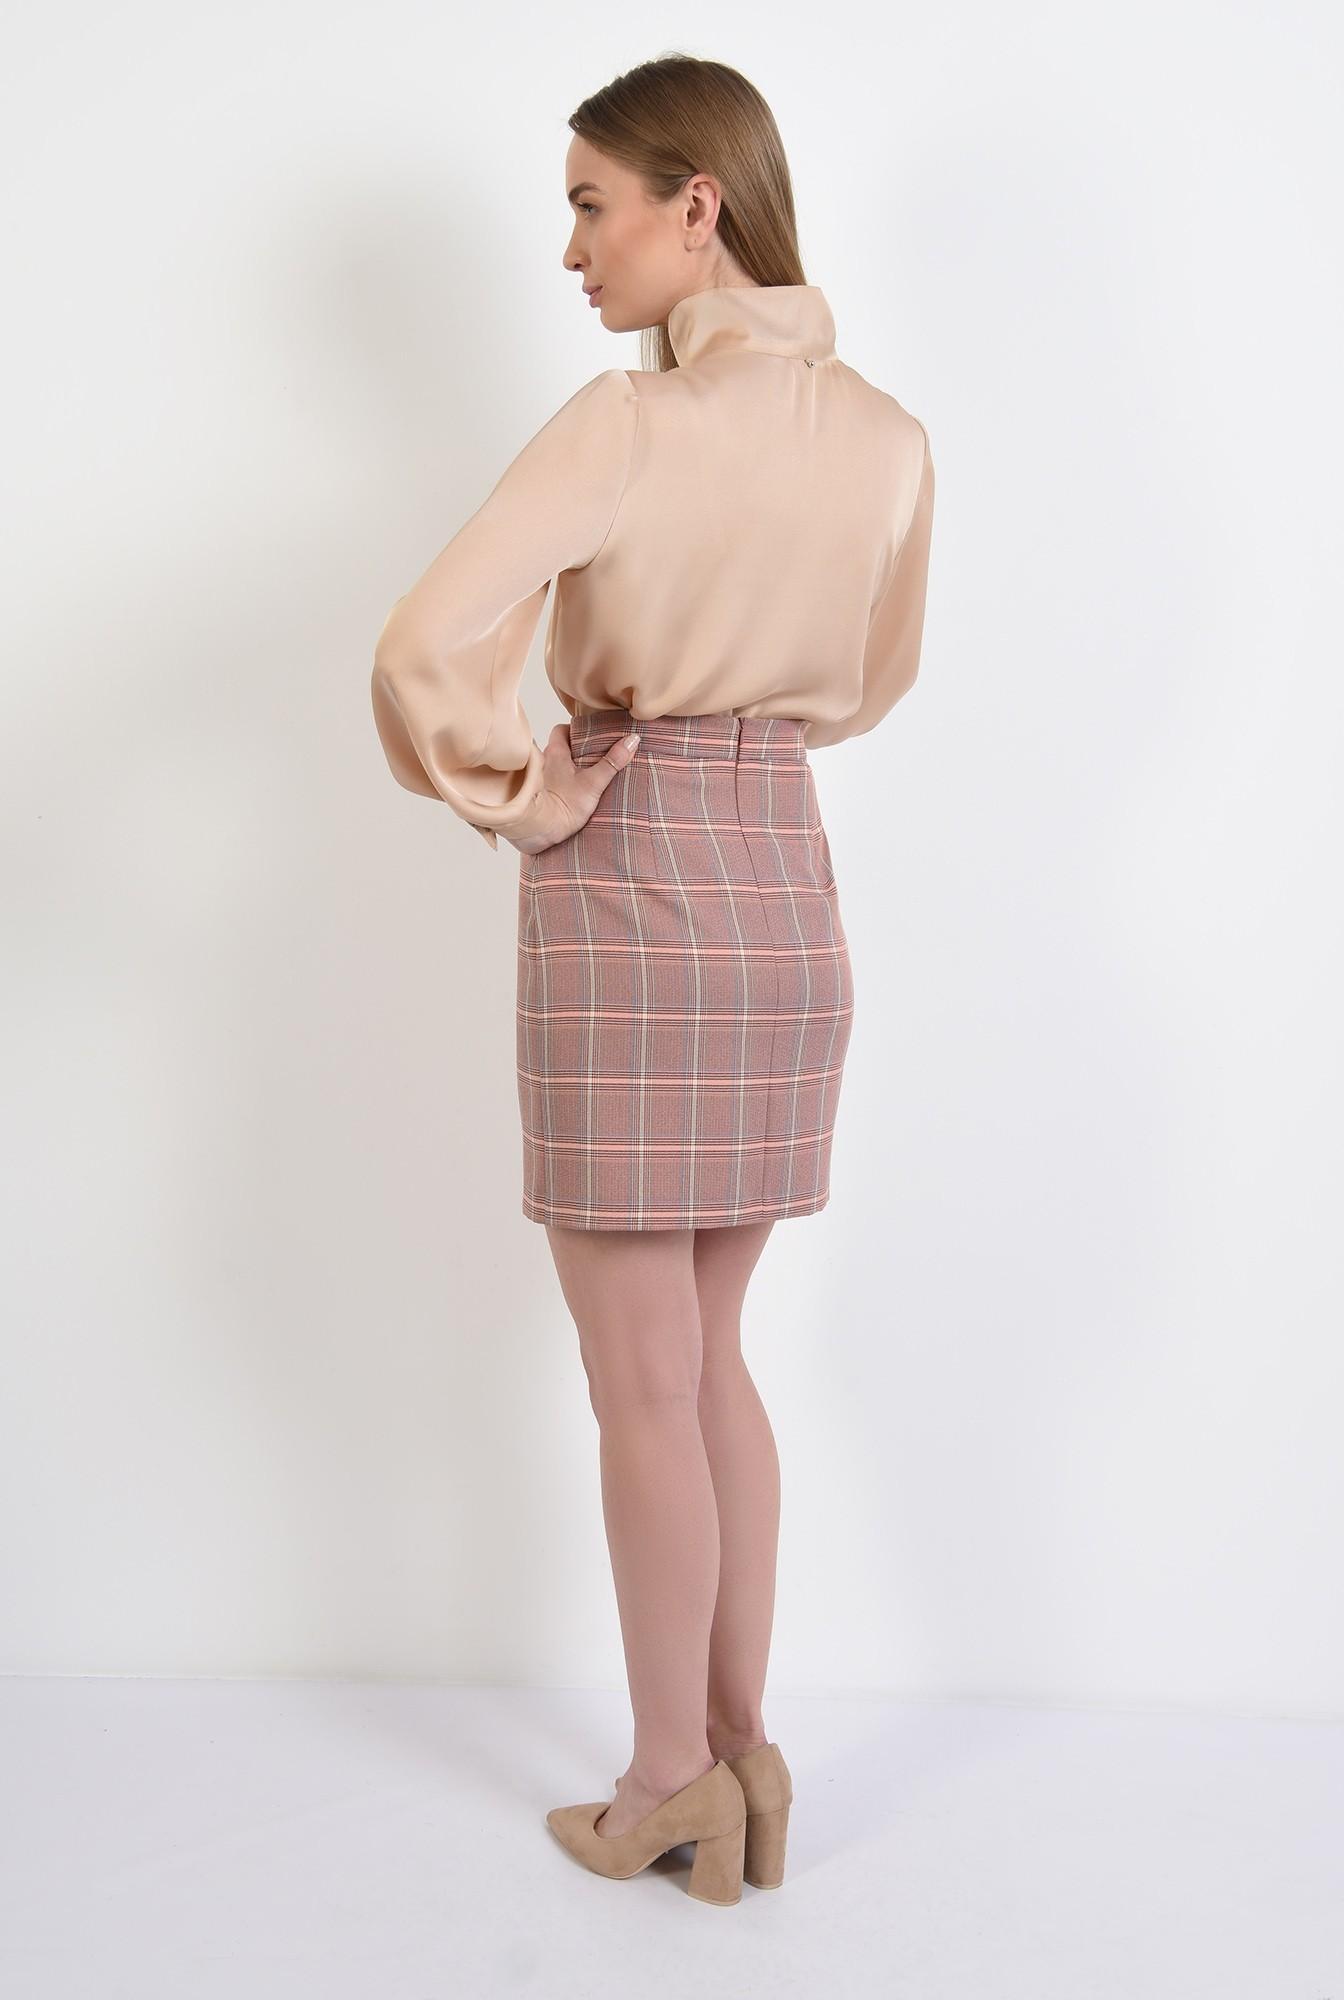 1 -  fusta in carouri, nude, peach, mini, cu talie inalta, fusta office